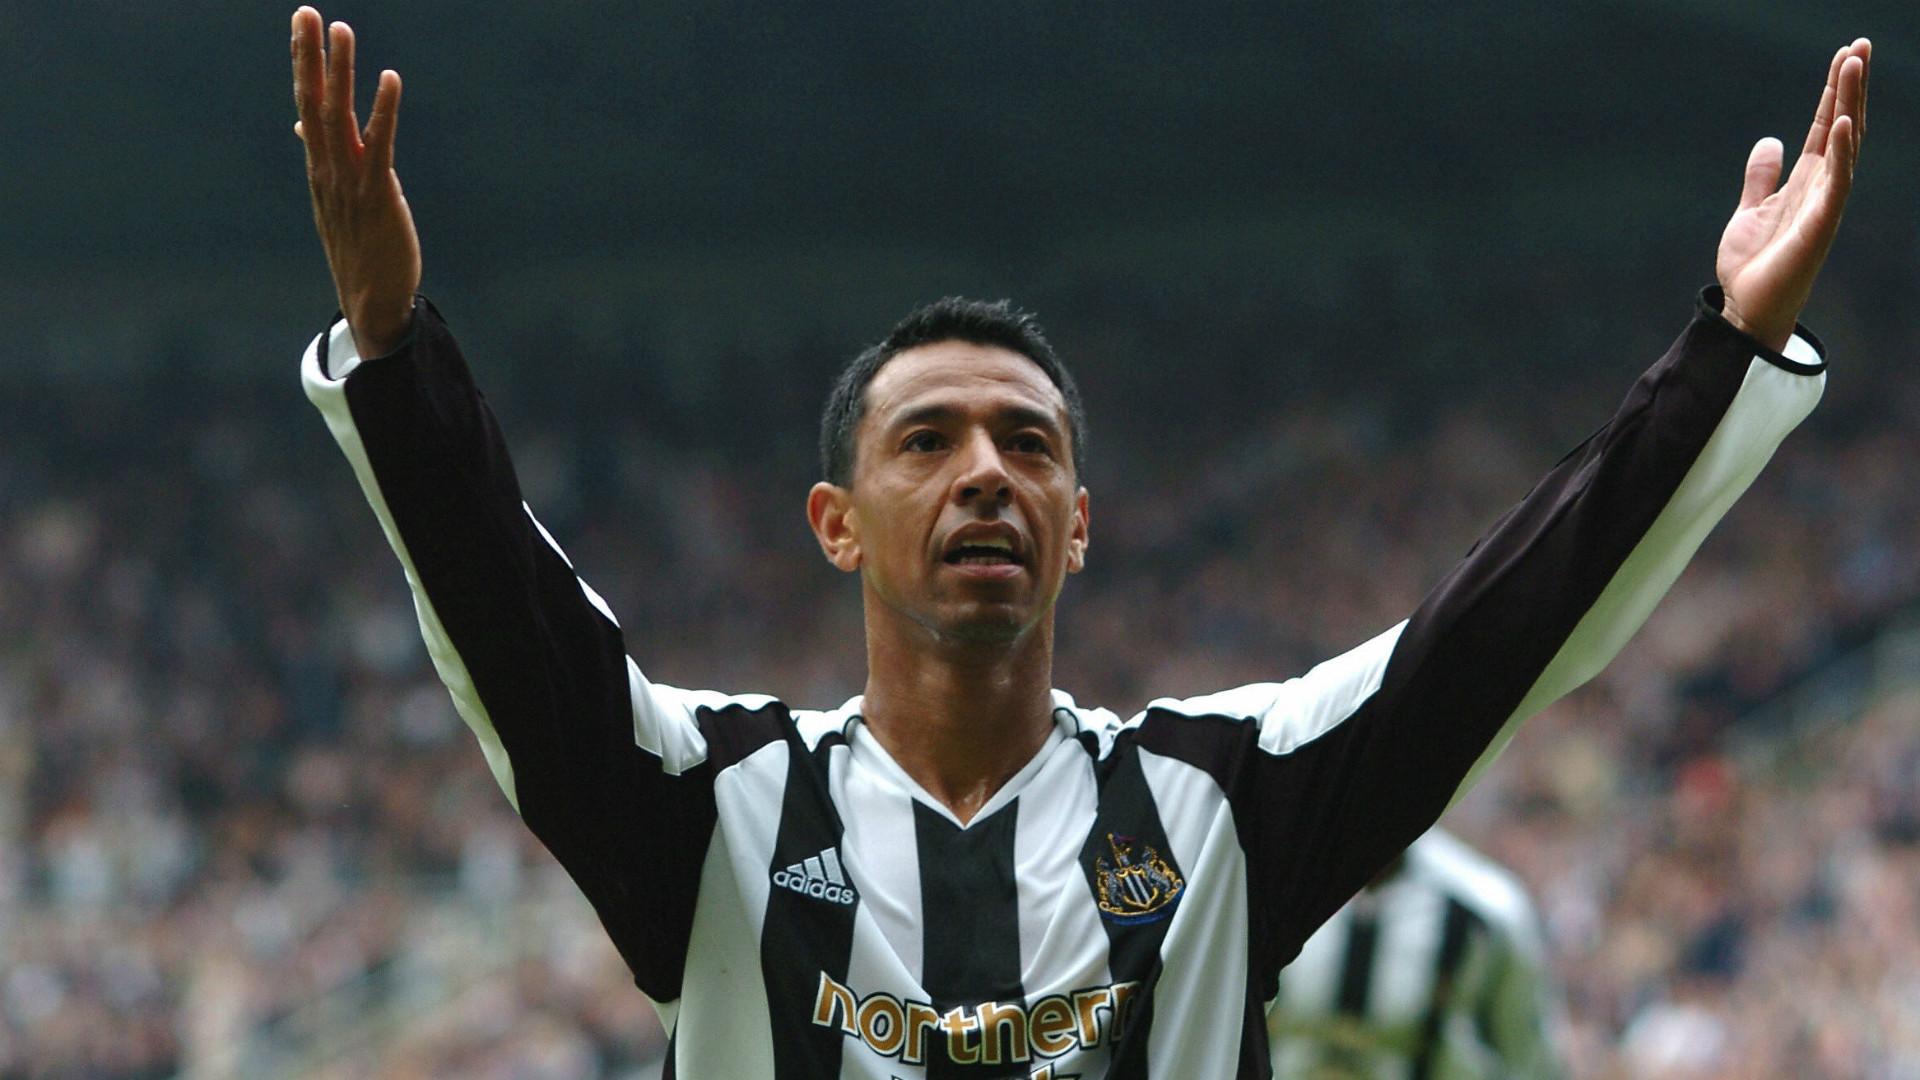 Newcastle legend Solano arrested after breaking Peru coronavirus curfew